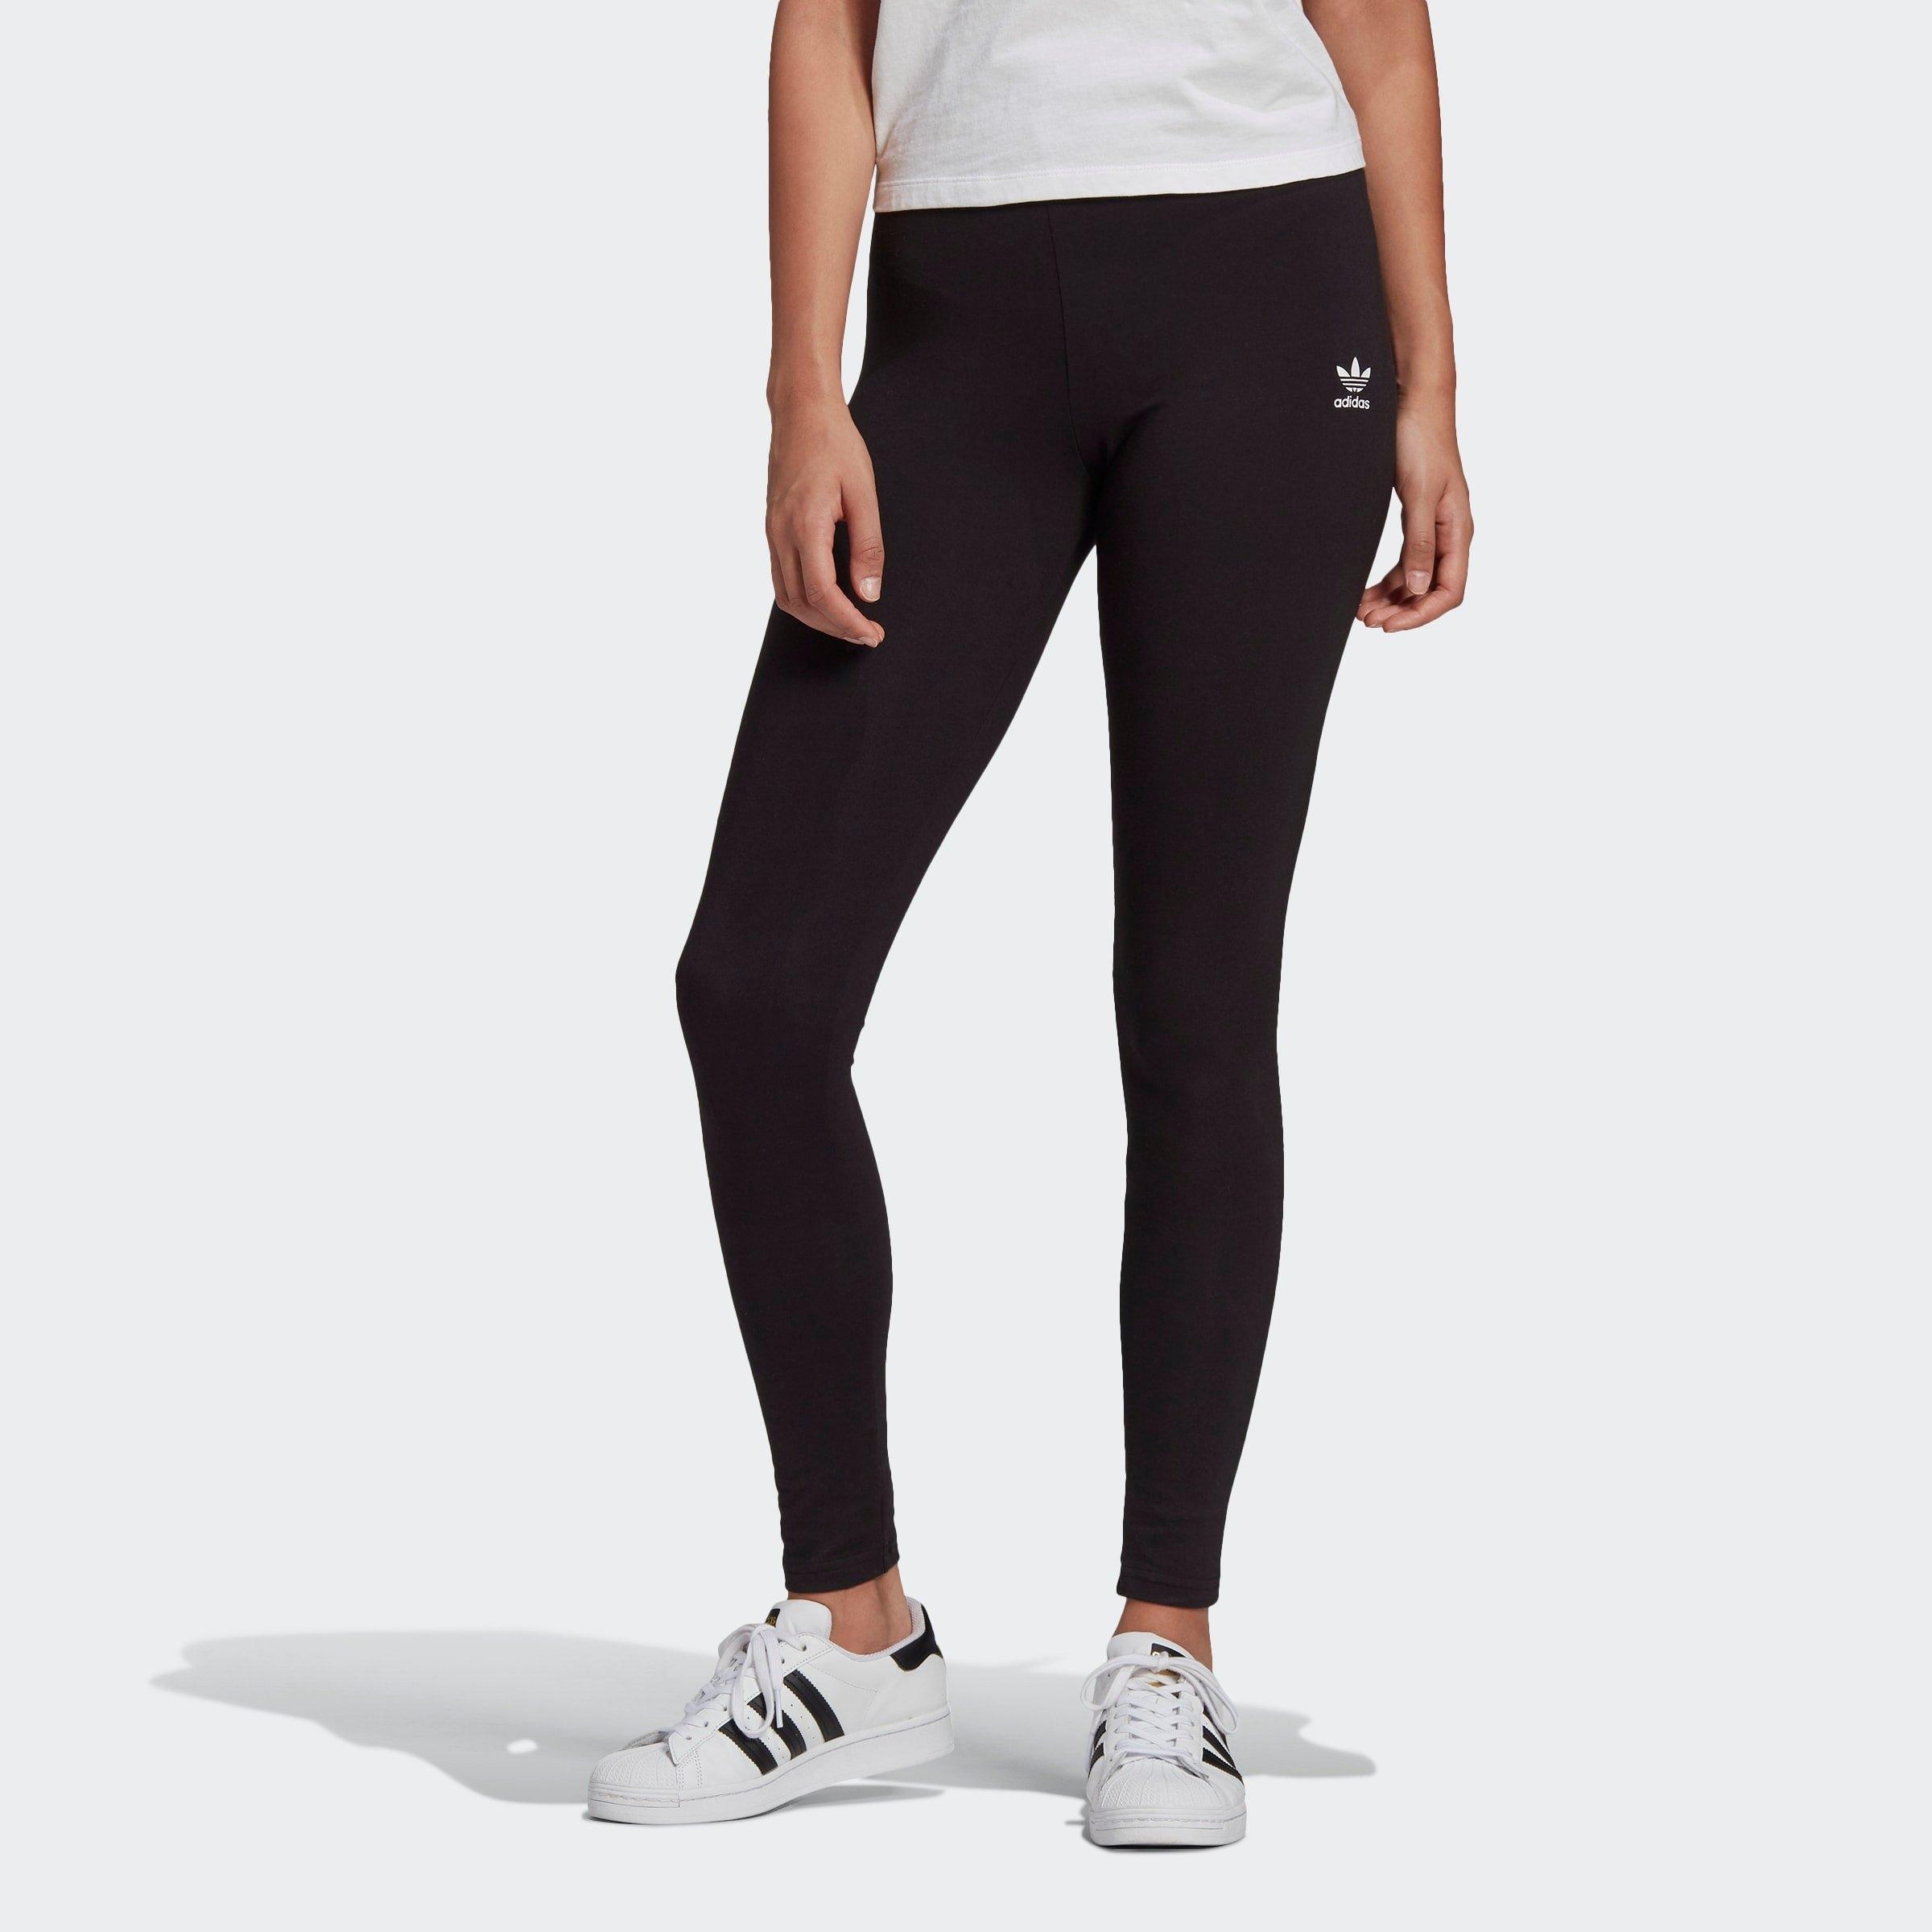 adidas Originals legging »ADICOLOR ESSENTIALS« goedkoop op otto.nl kopen